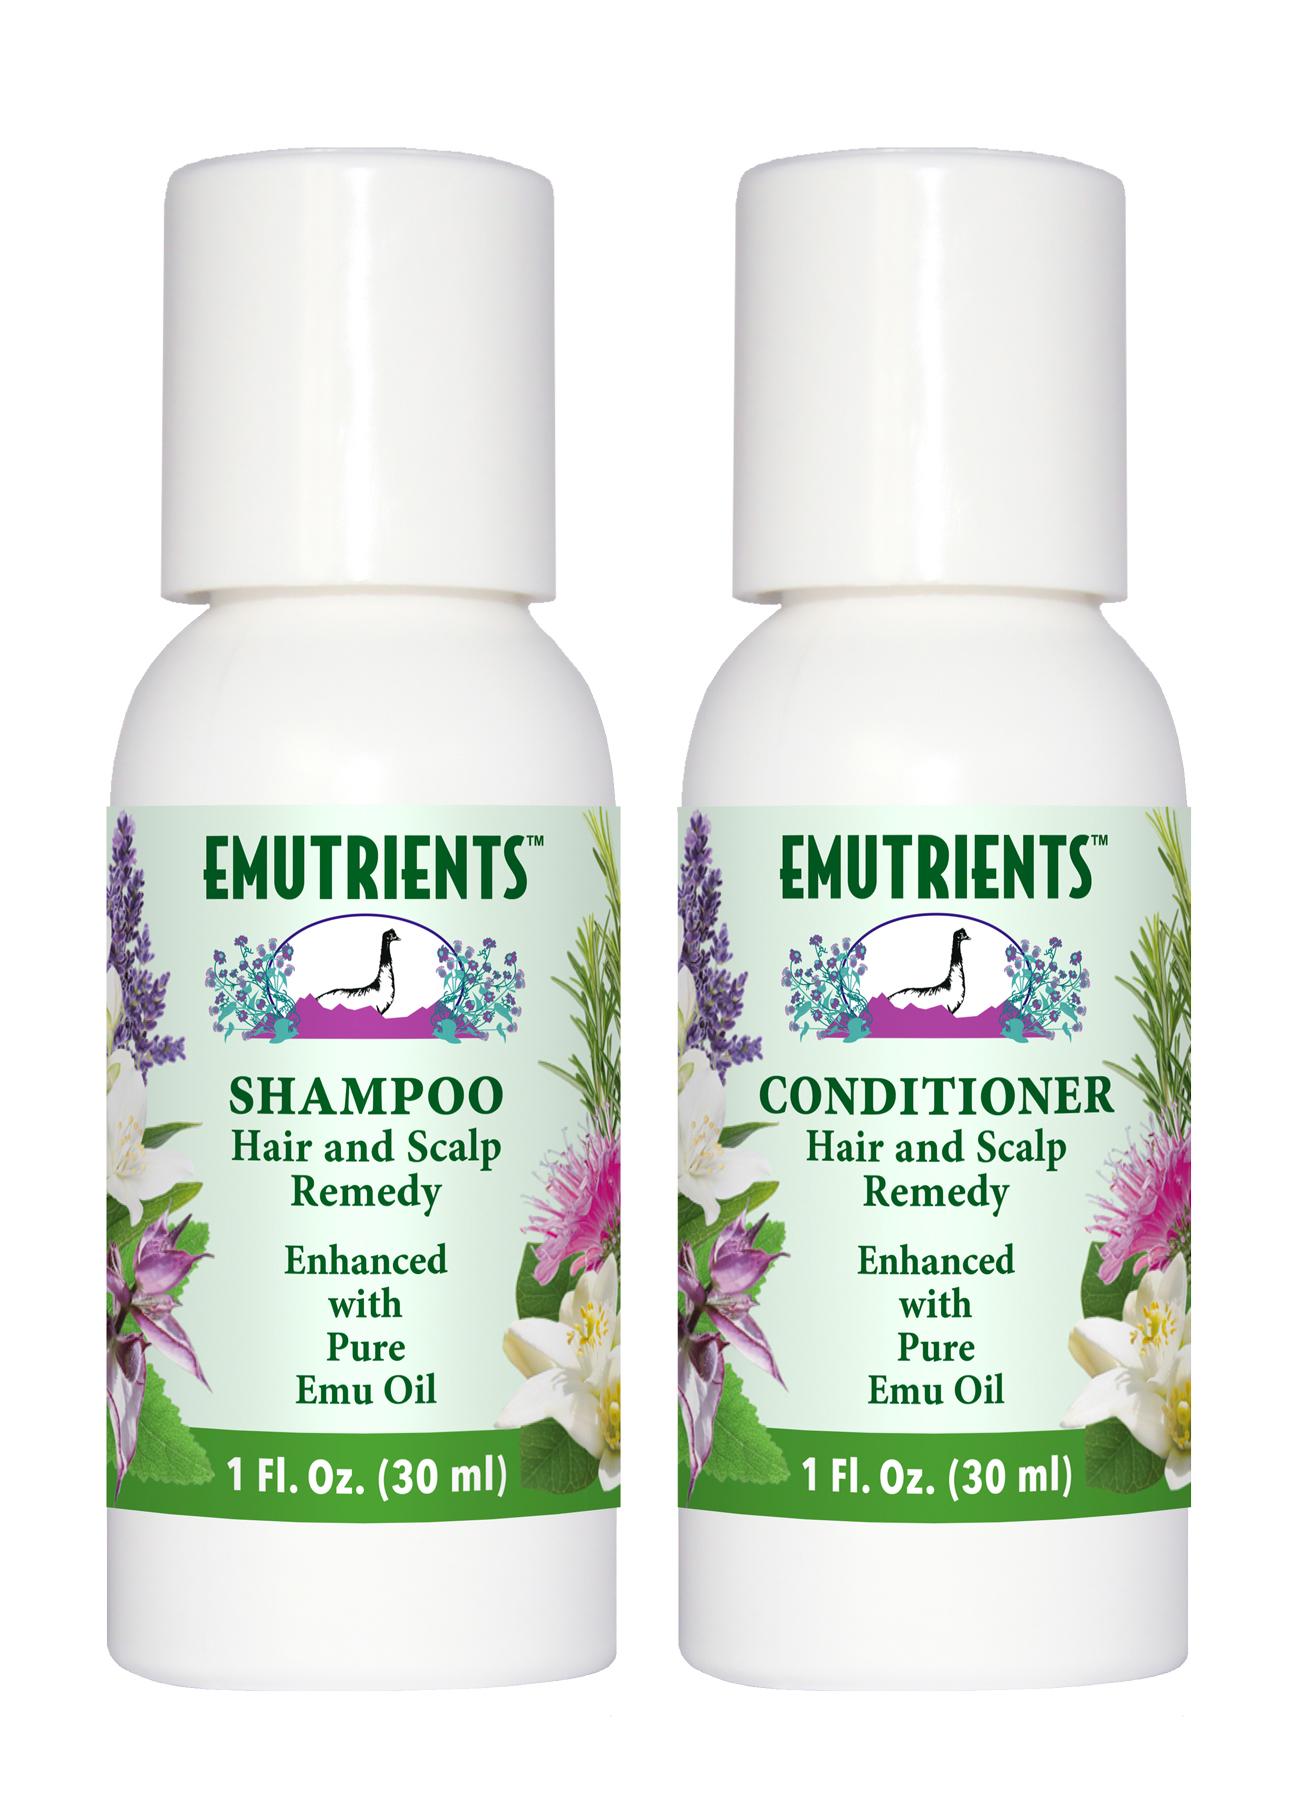 EMUTRIENTS™ Shampoo & Conditioner by Montana Emu Ranch Company